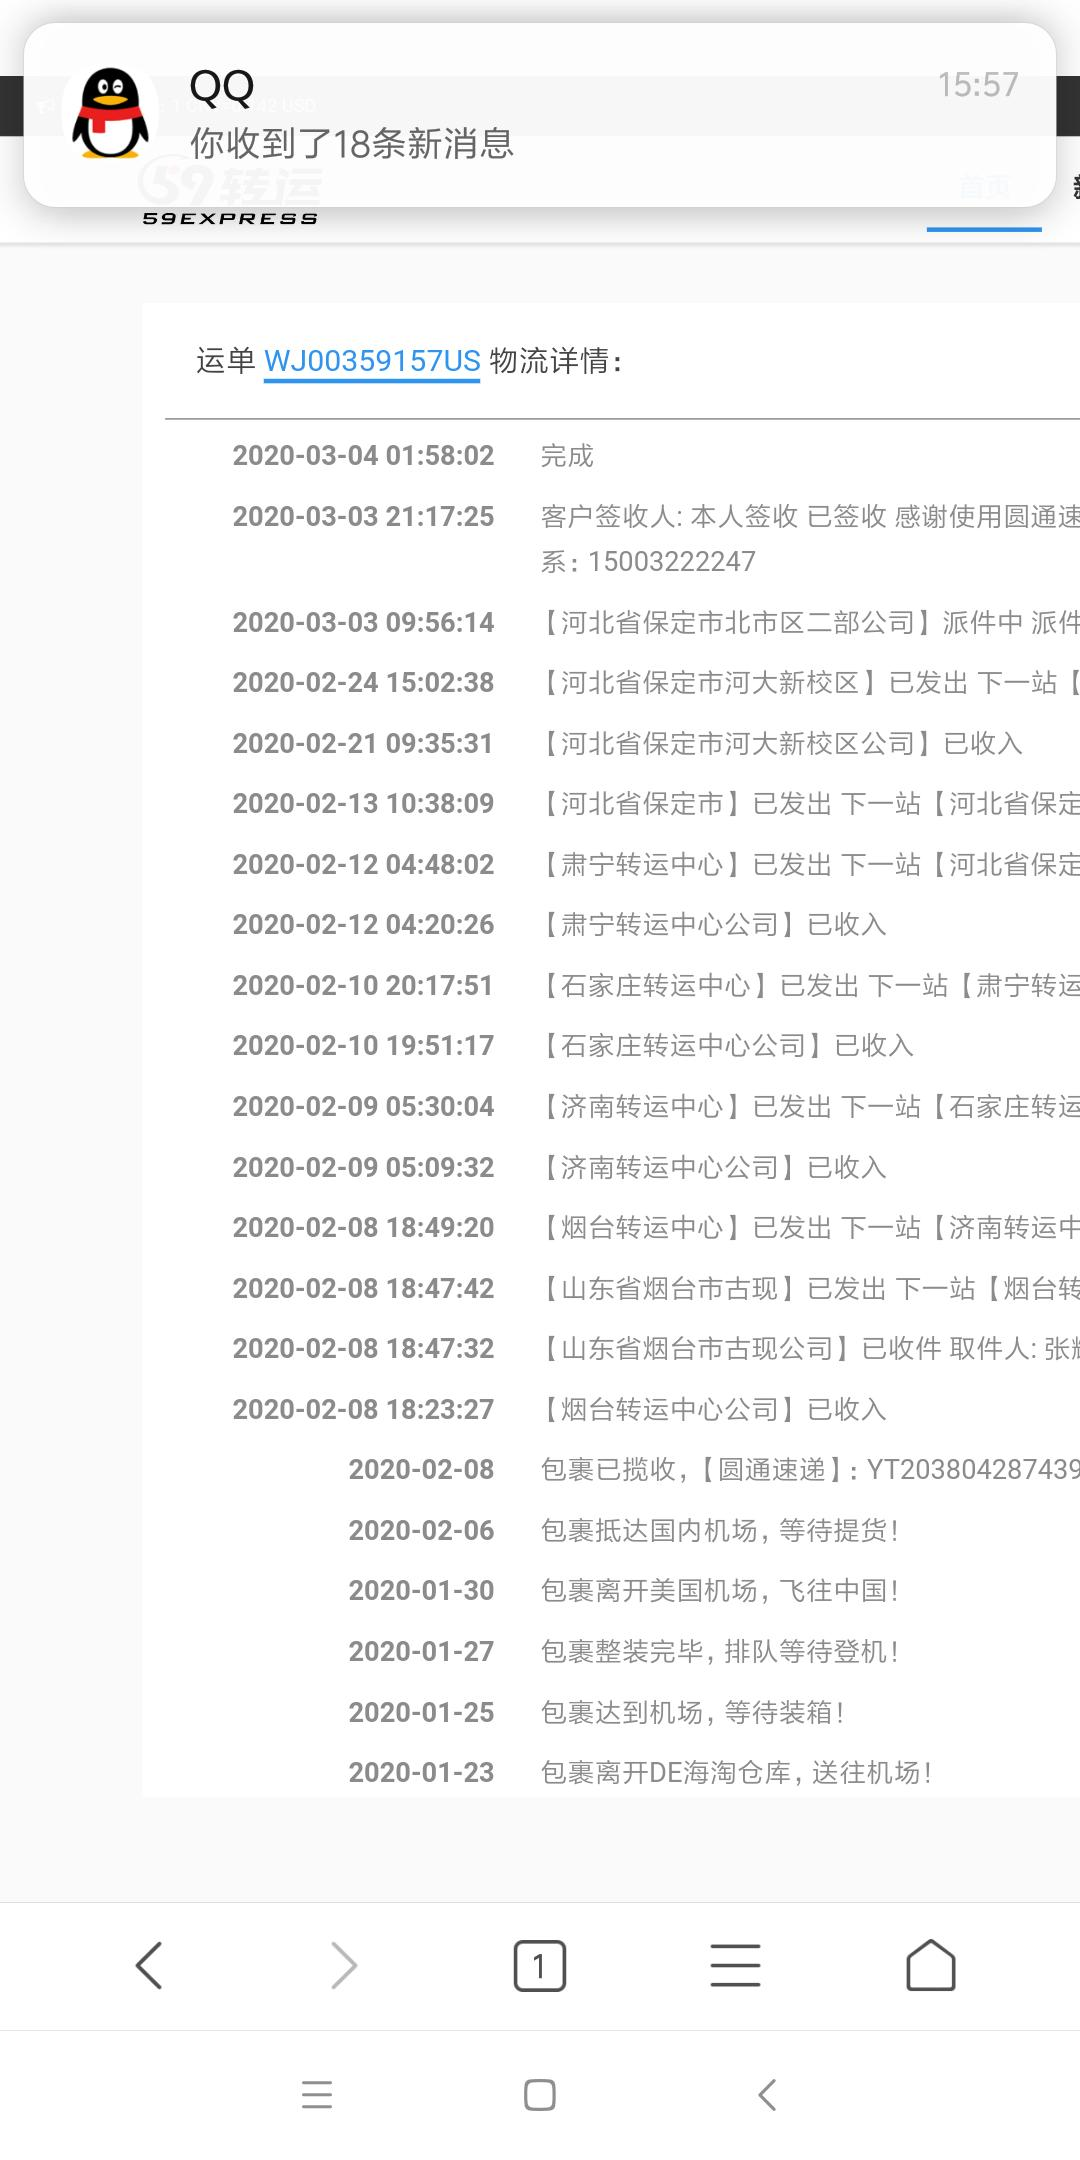 Screenshot_2020-03-06-15-57-34-422_com.android.browser.png